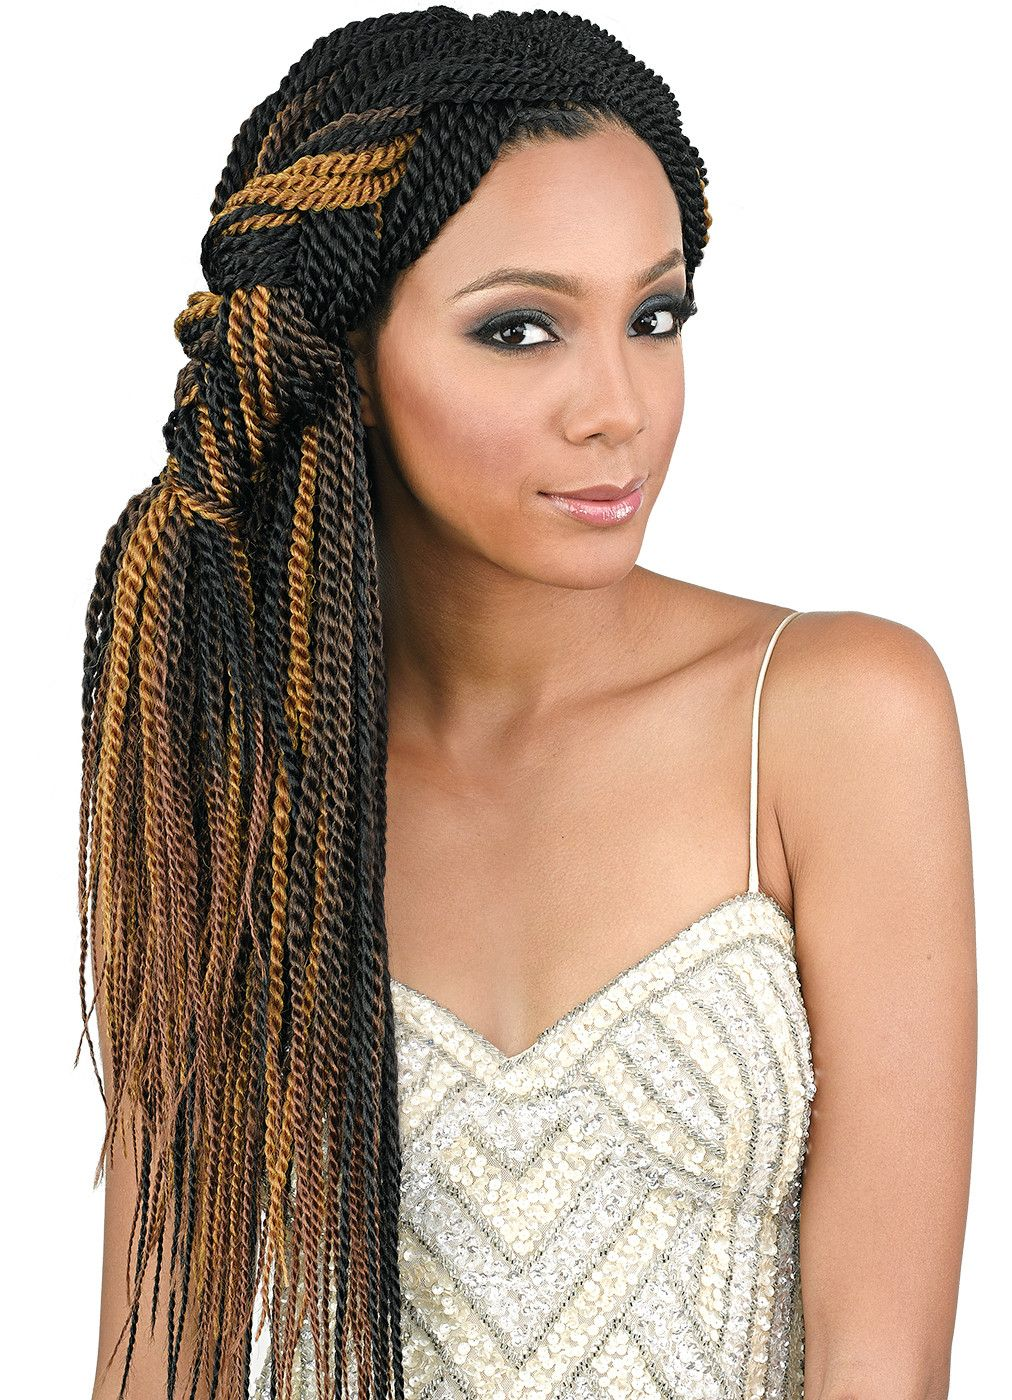 40 Super Chic Senegalese Twist Styles We Love! - Part 3